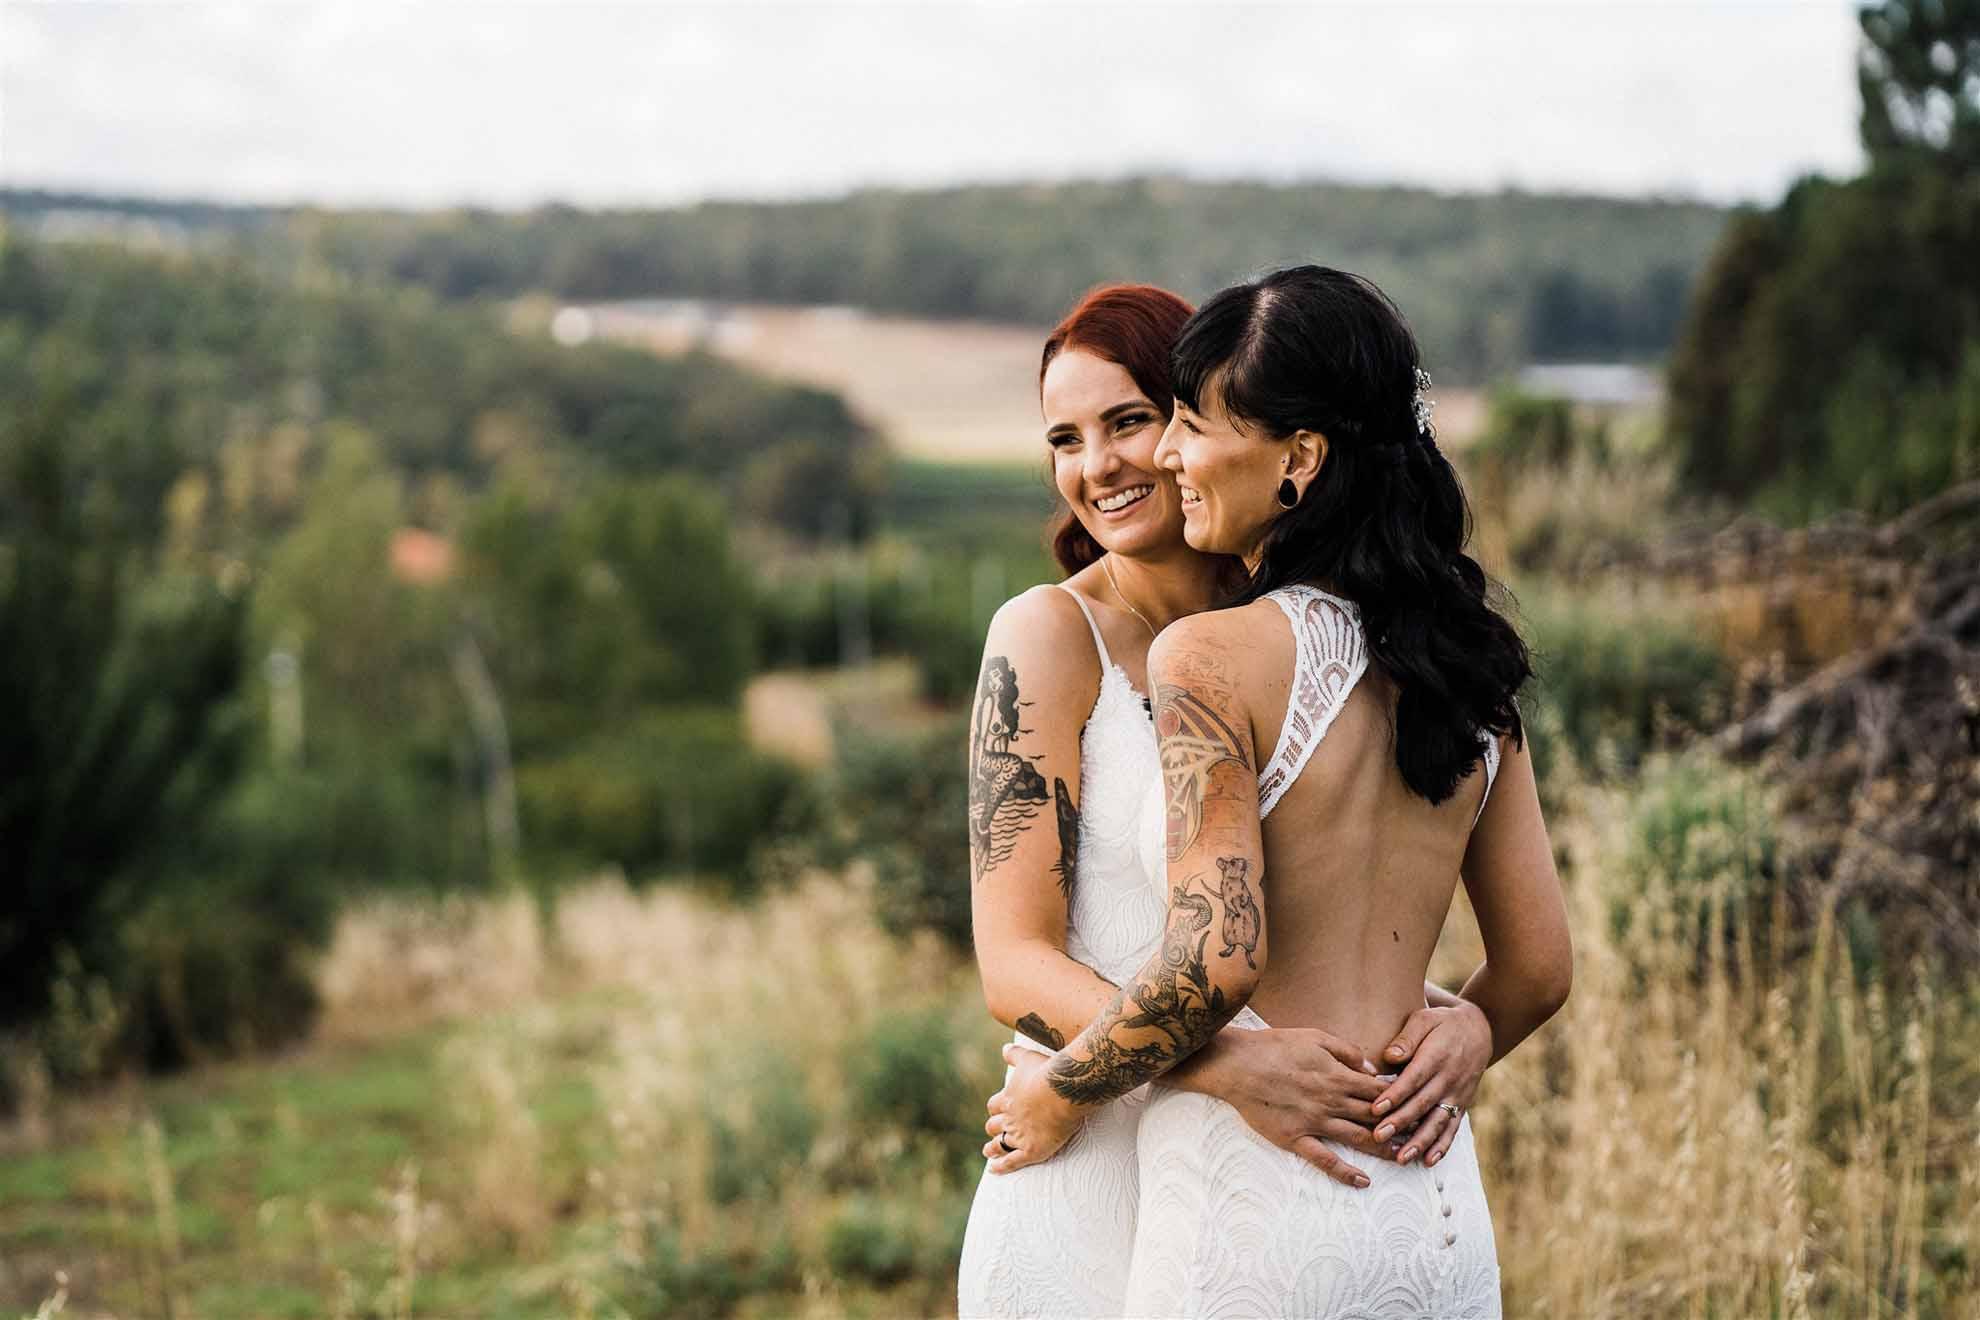 Peggy-Saas-Lesbian-Wedding-Perth-Australia-Dancing-With-Her magazine